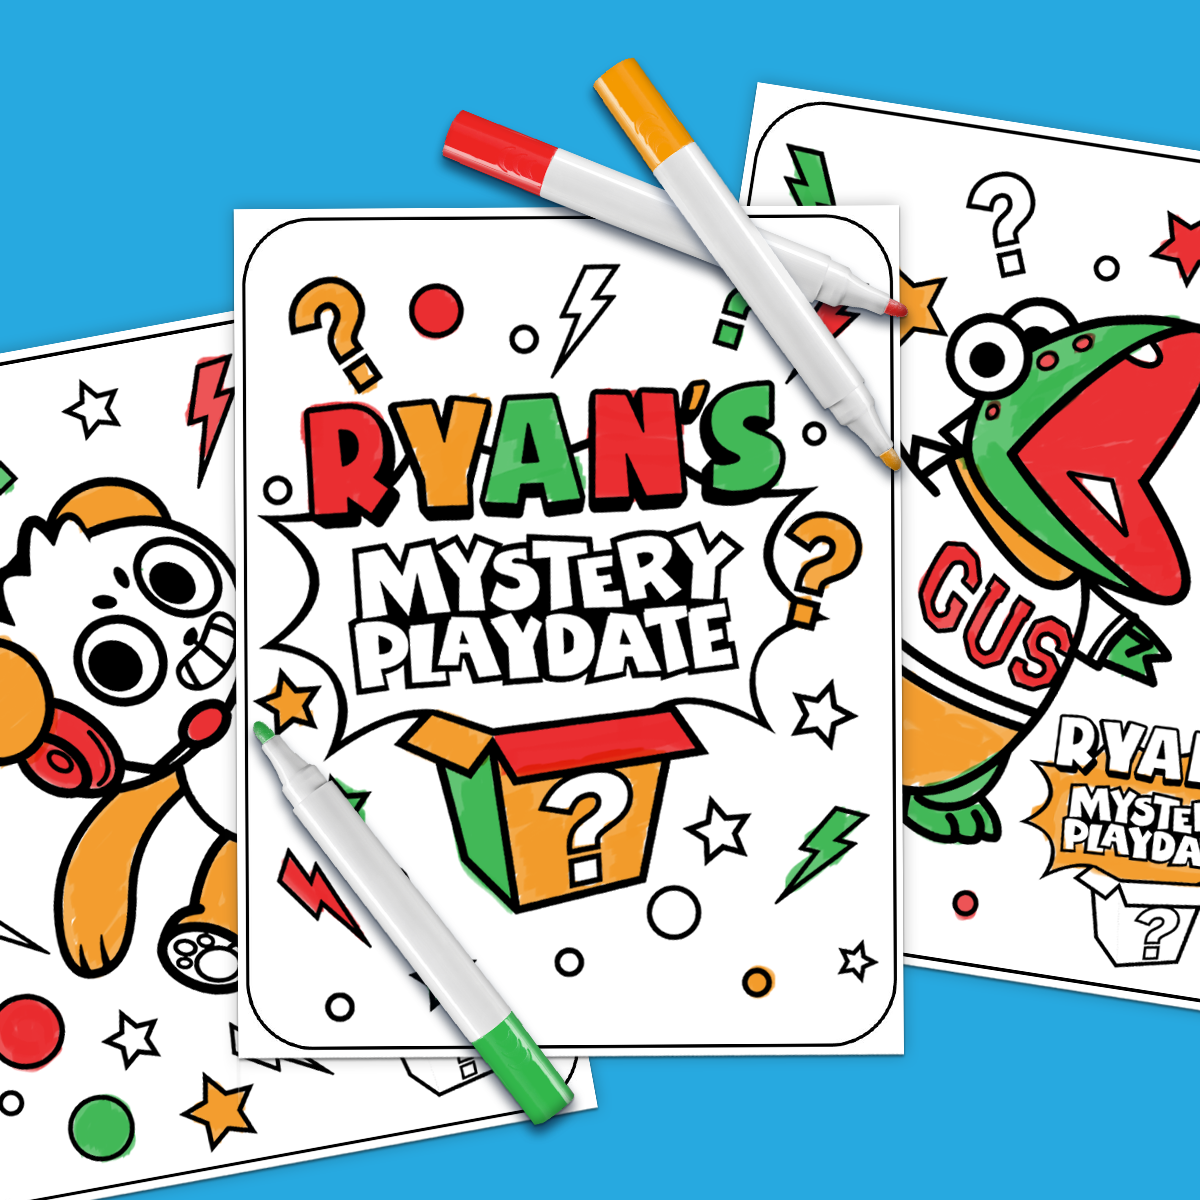 Ryans mystery playdate 3 marker challenge